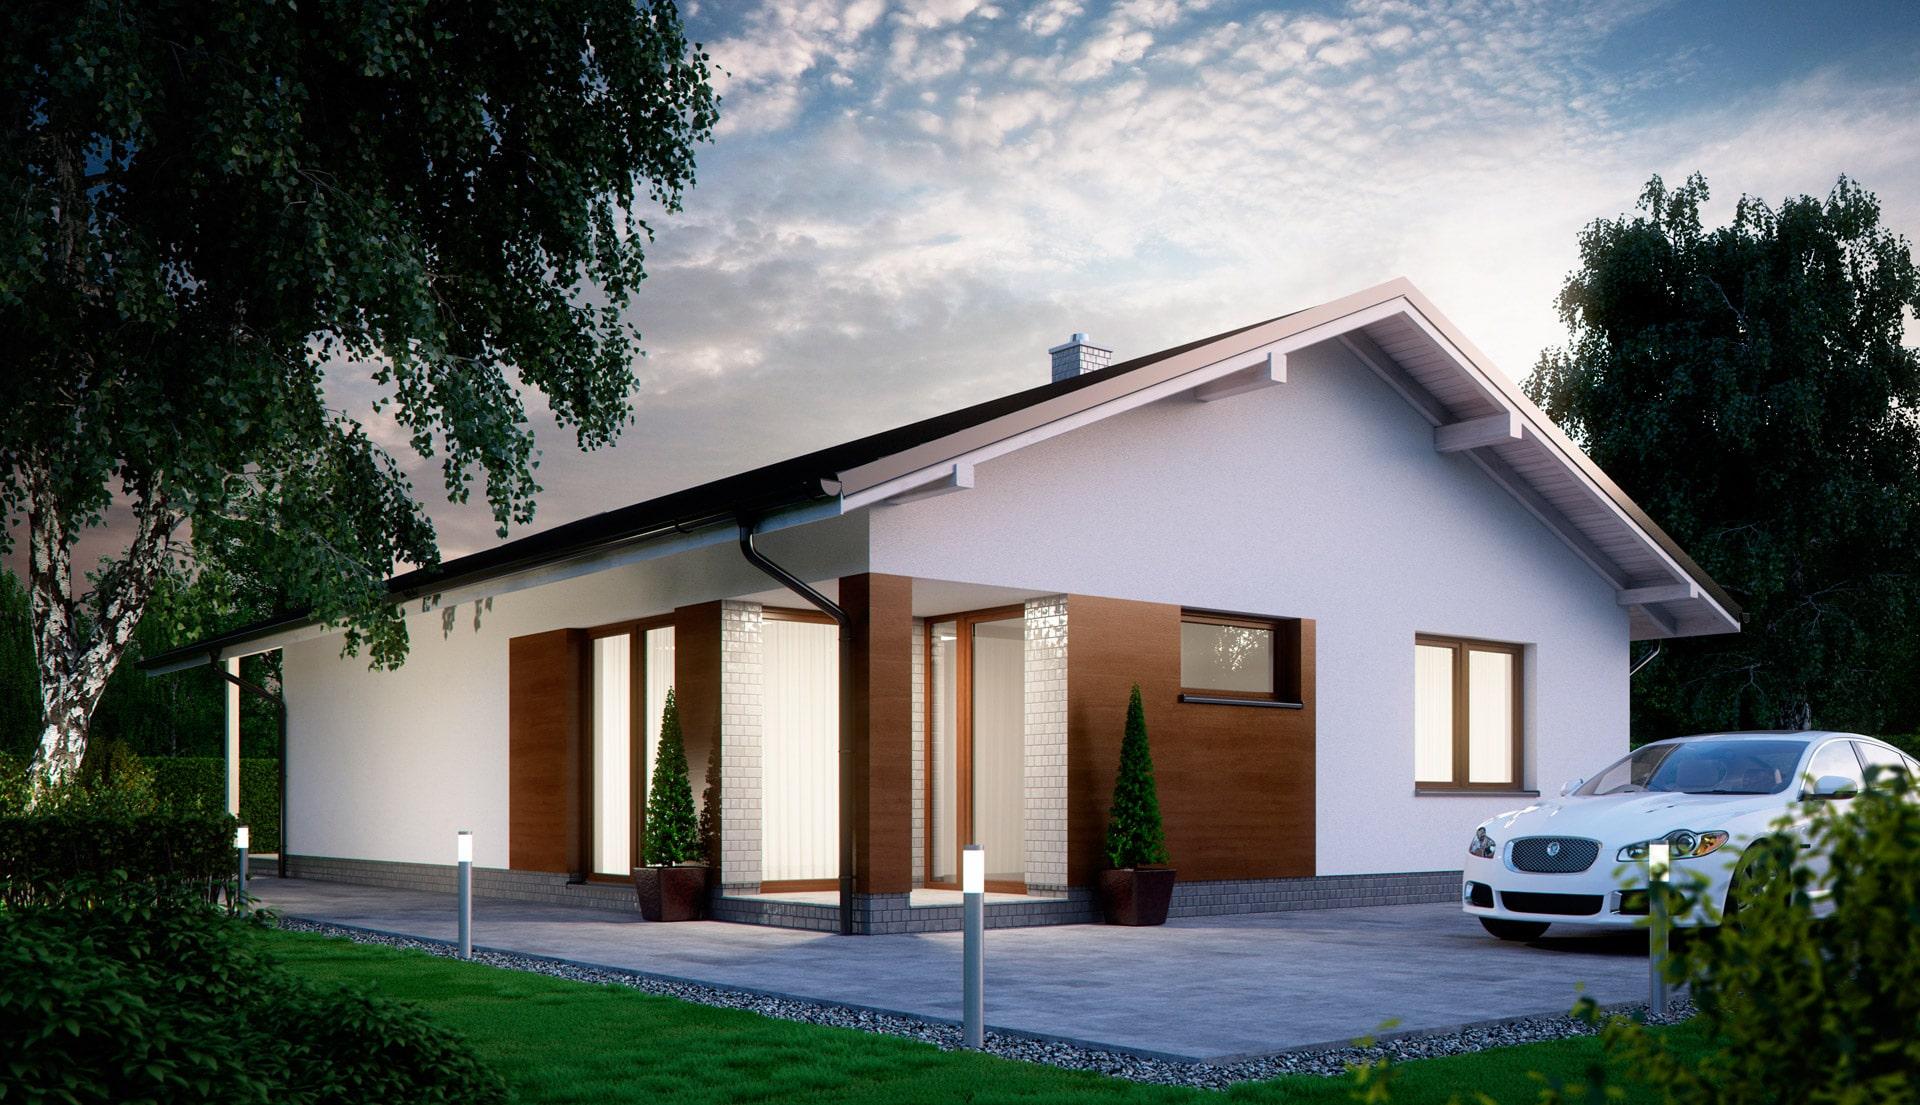 Проект одноэтажного дома c террасой «КО-143» - фото №2